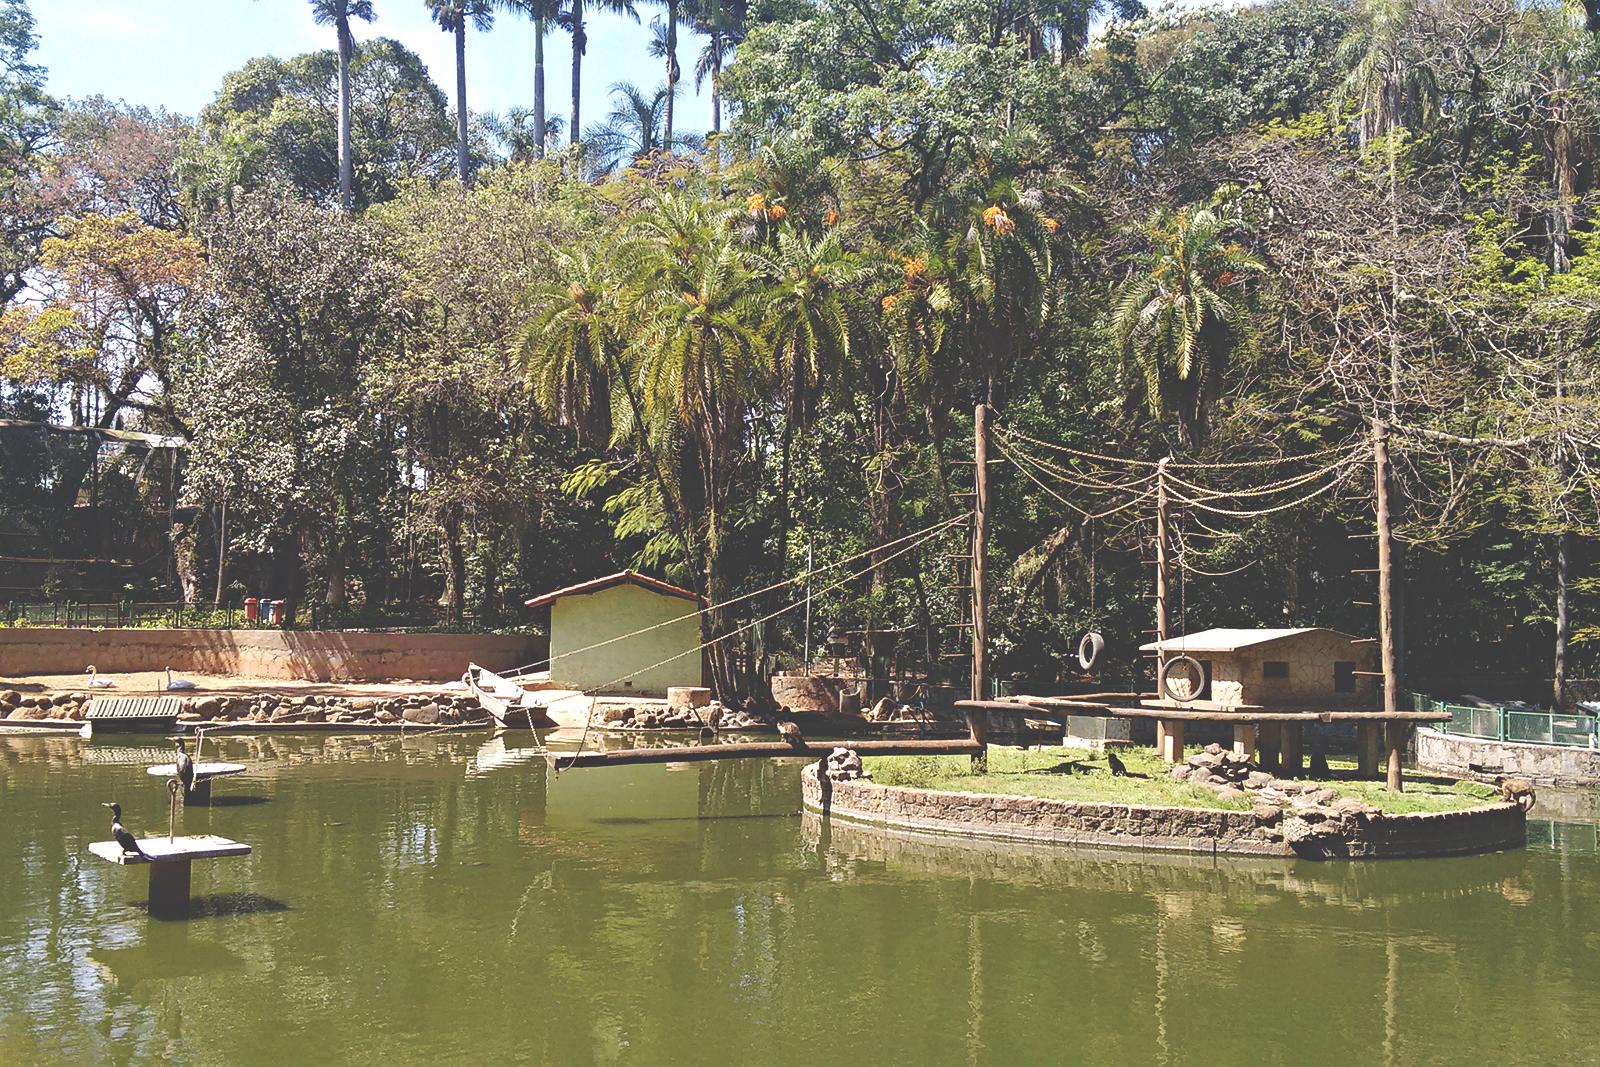 macacos zoológico campinas